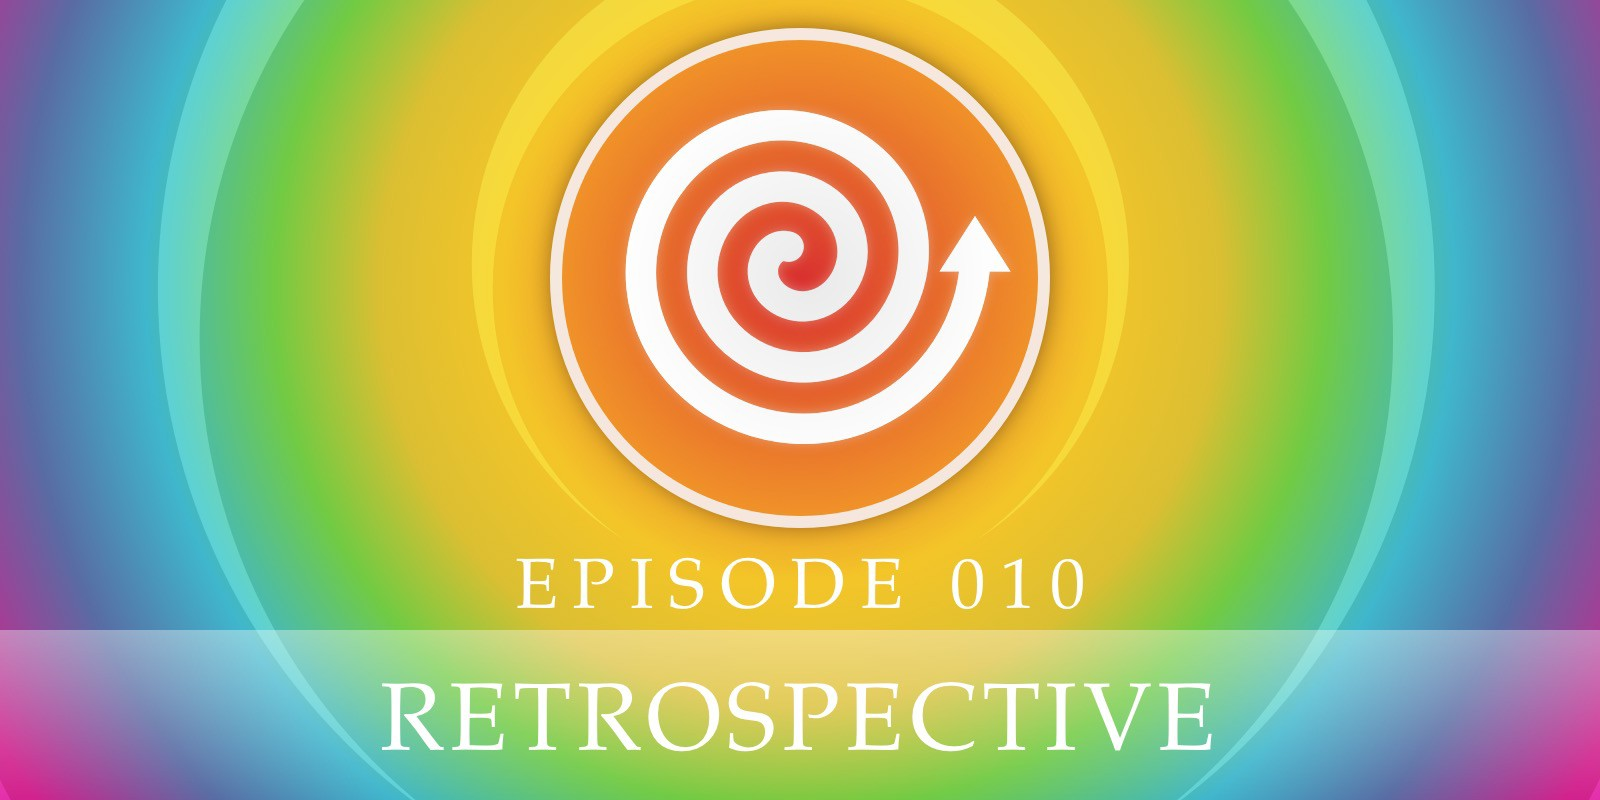 Episode 010: Retrospective